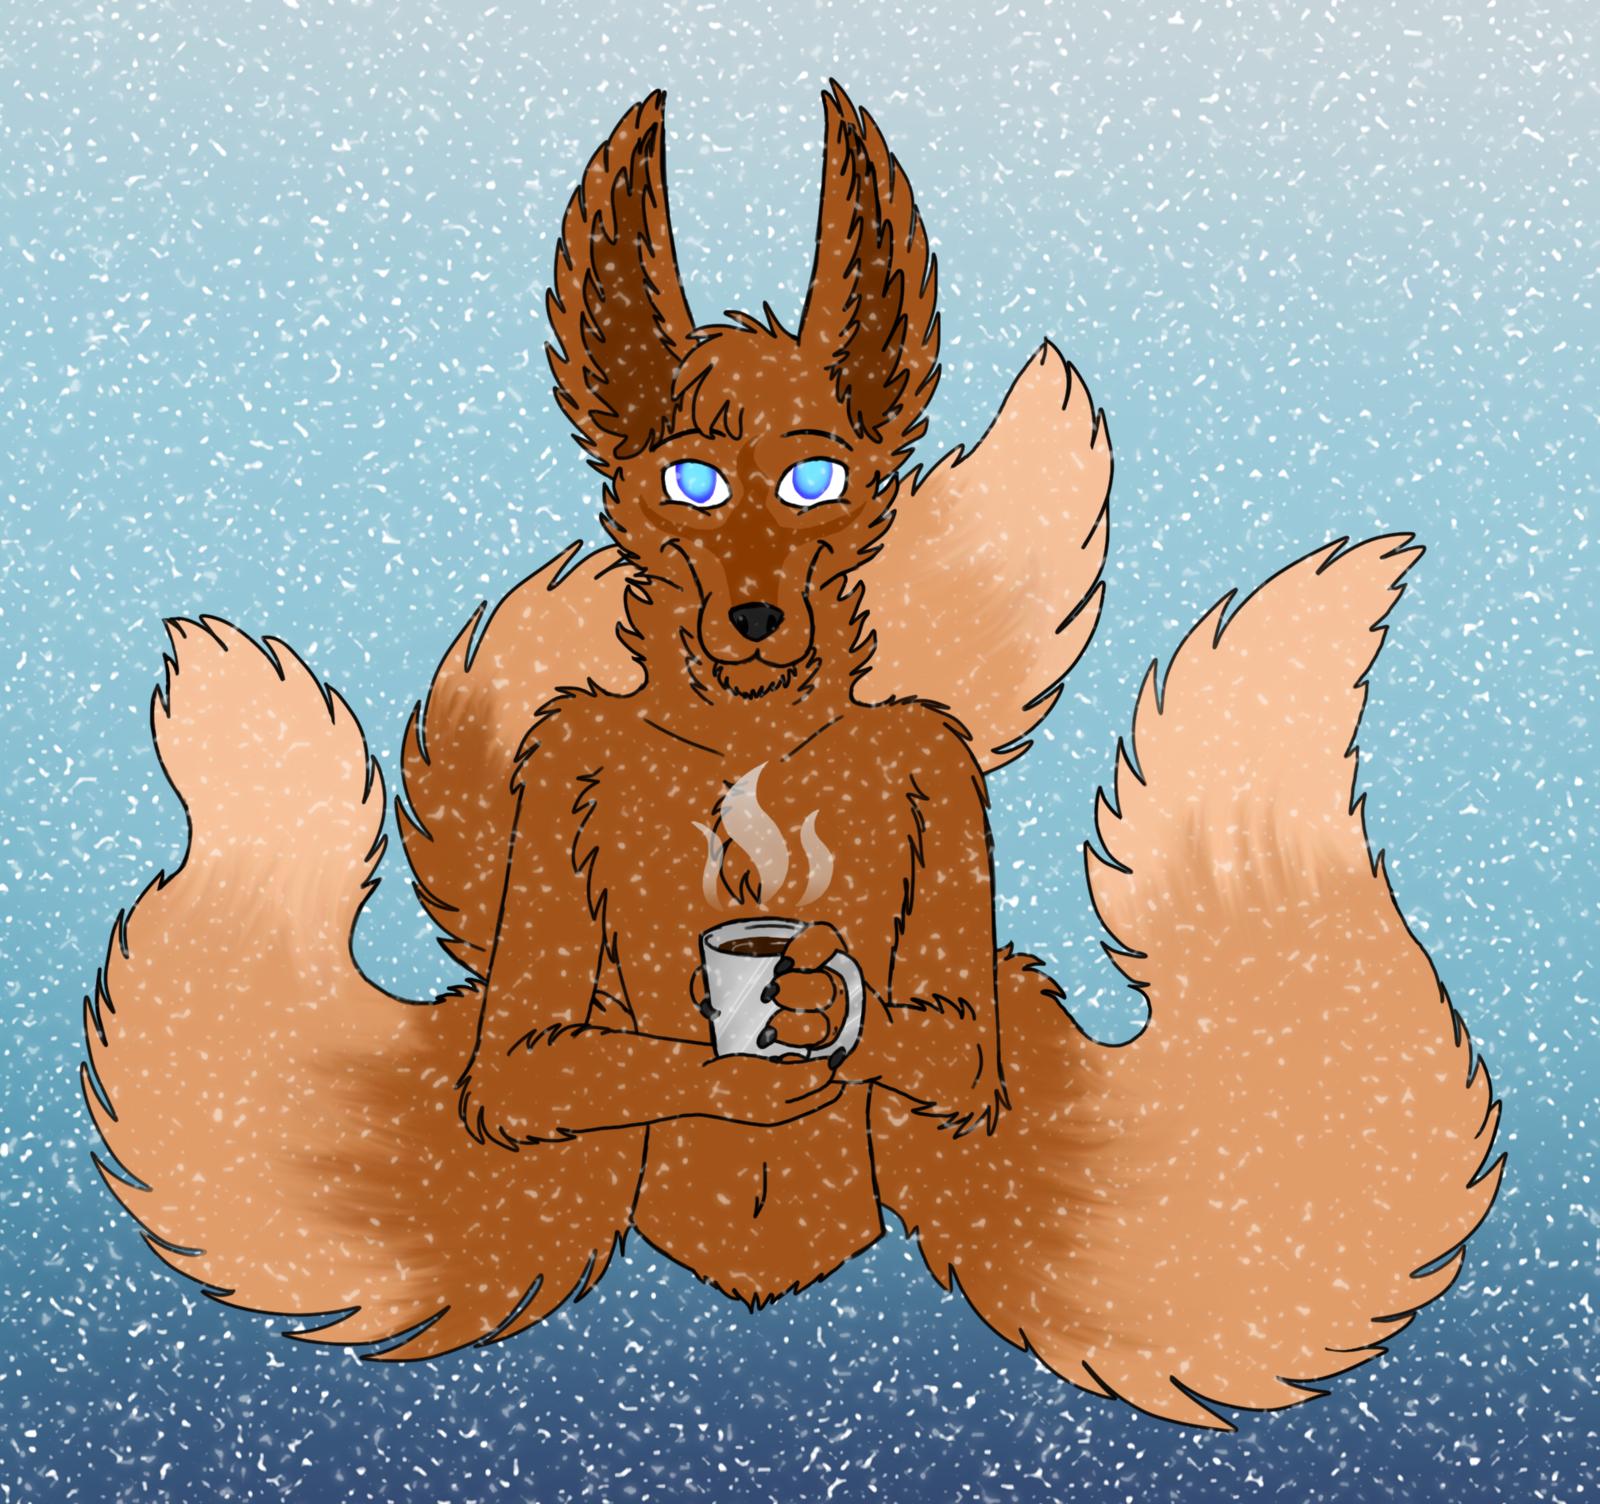 farr furry christmas art - Christmas Furry